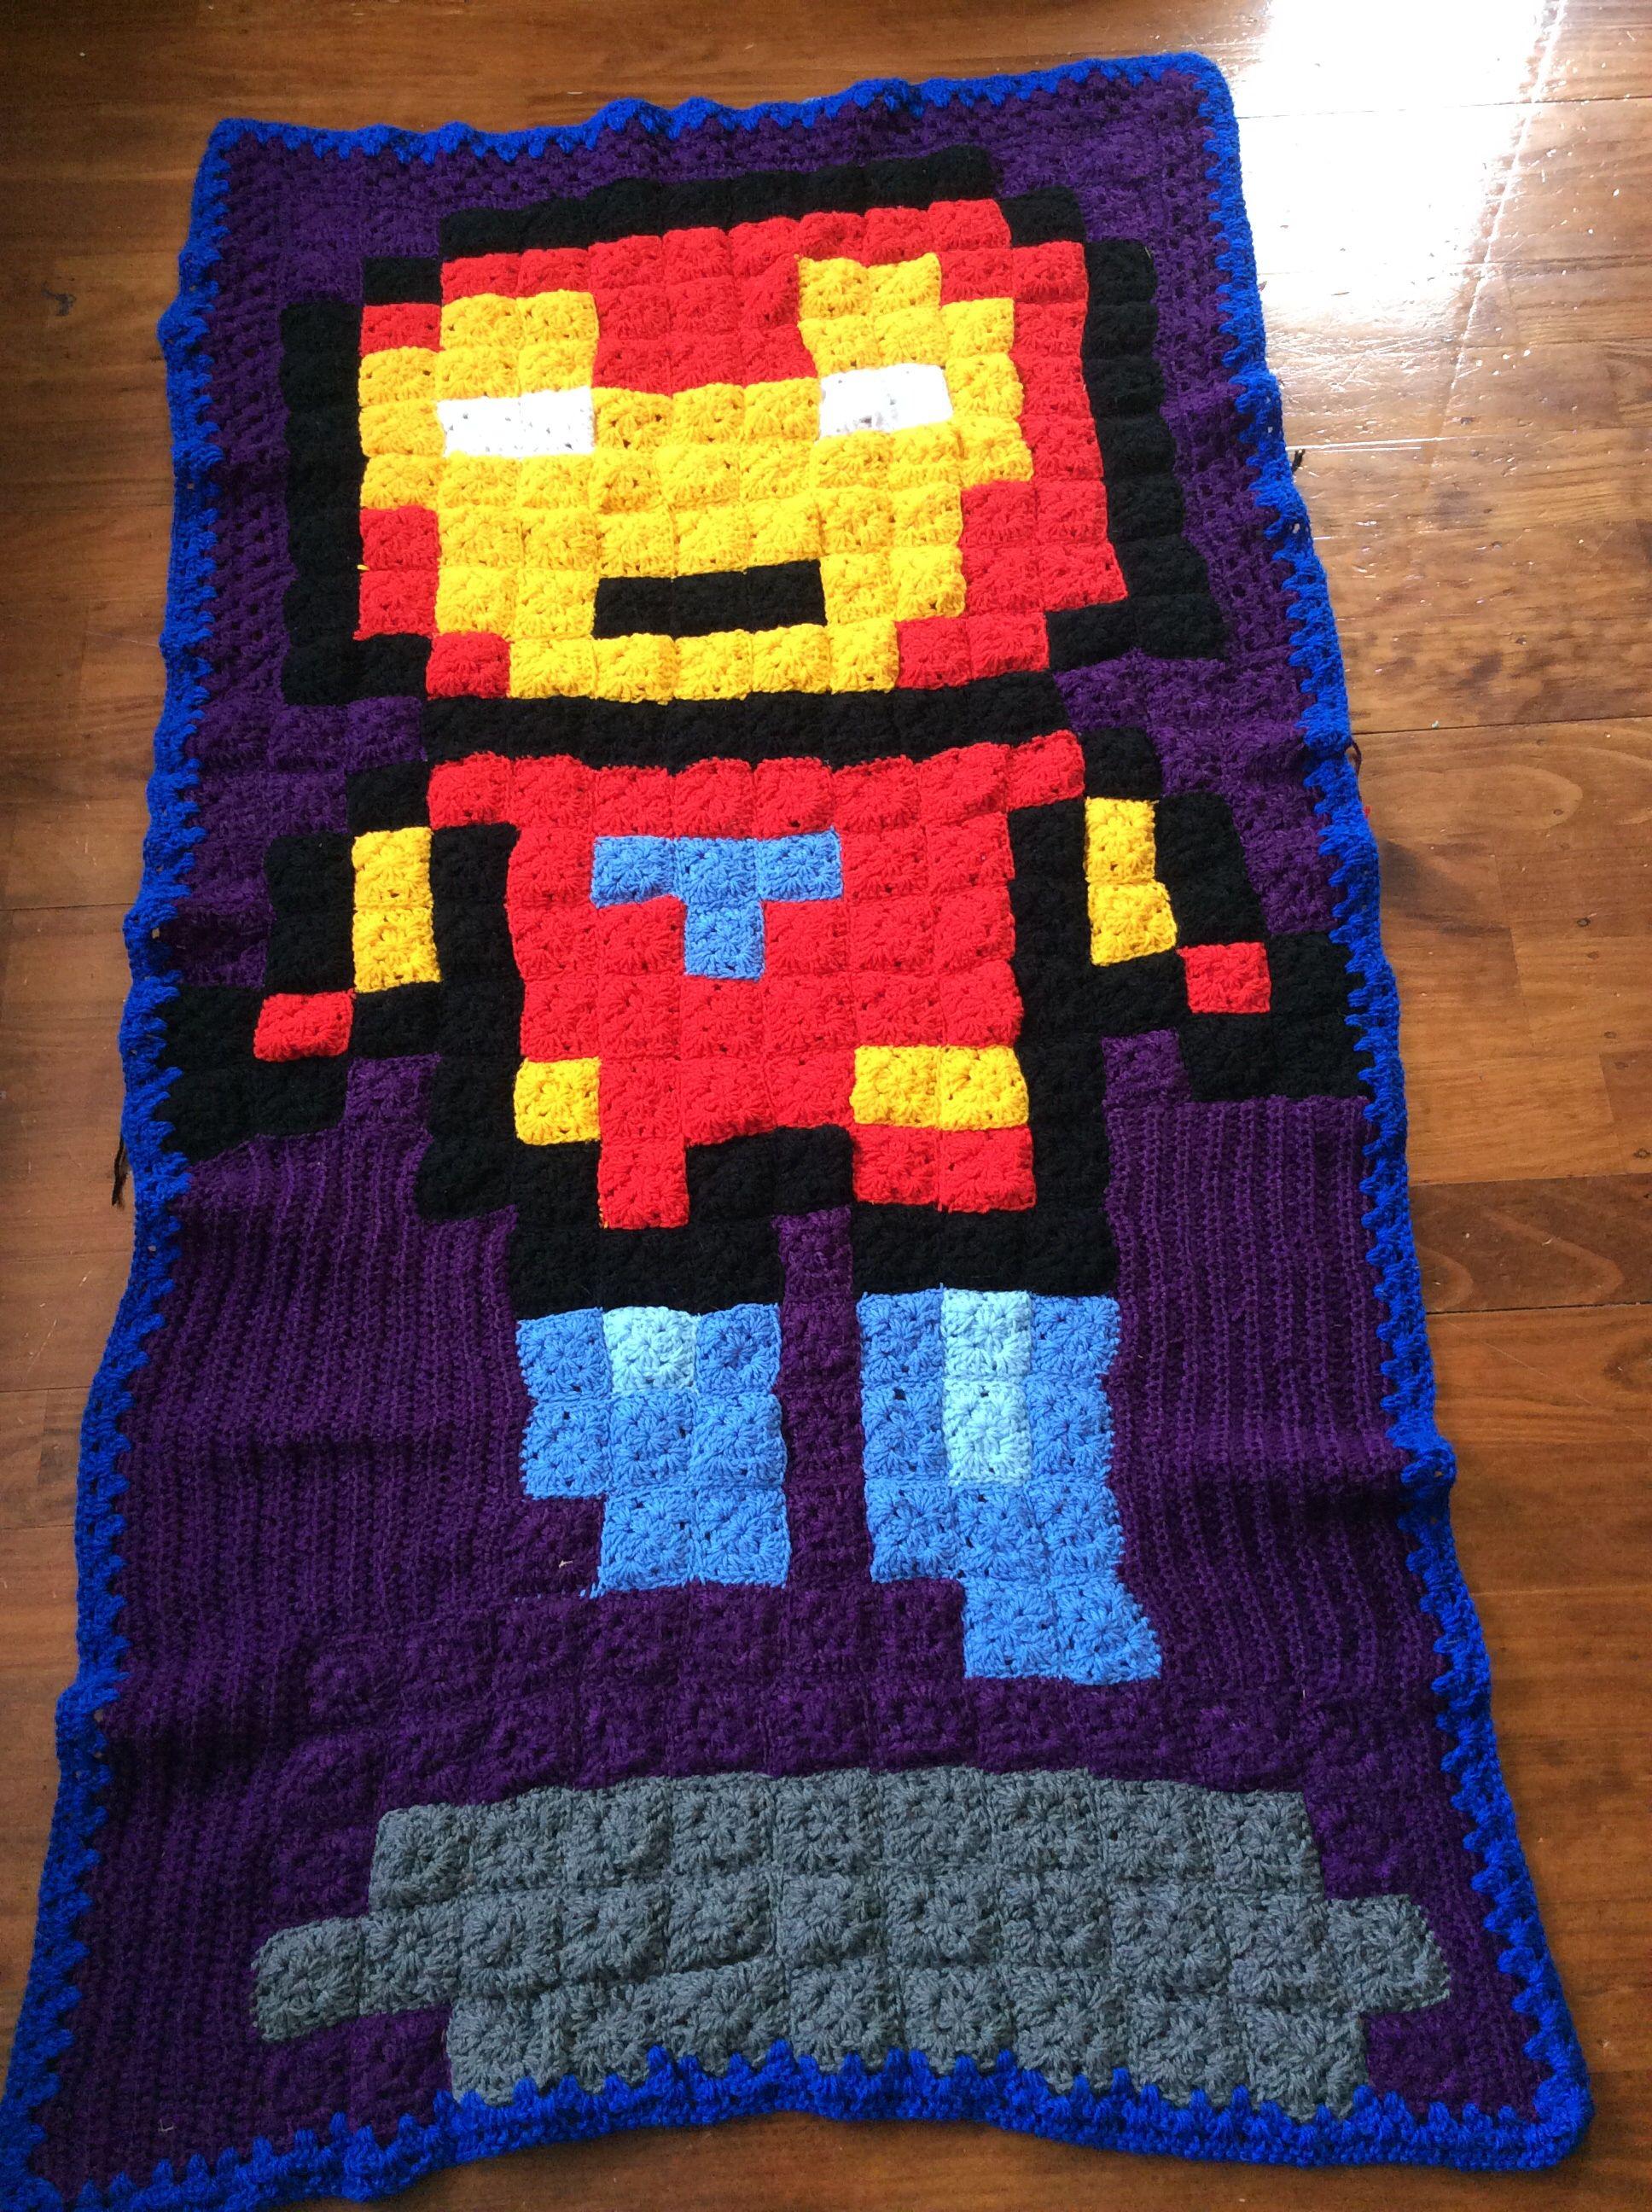 8bit Iron man granny square blanket. Crochet, minecraft pixel art ...